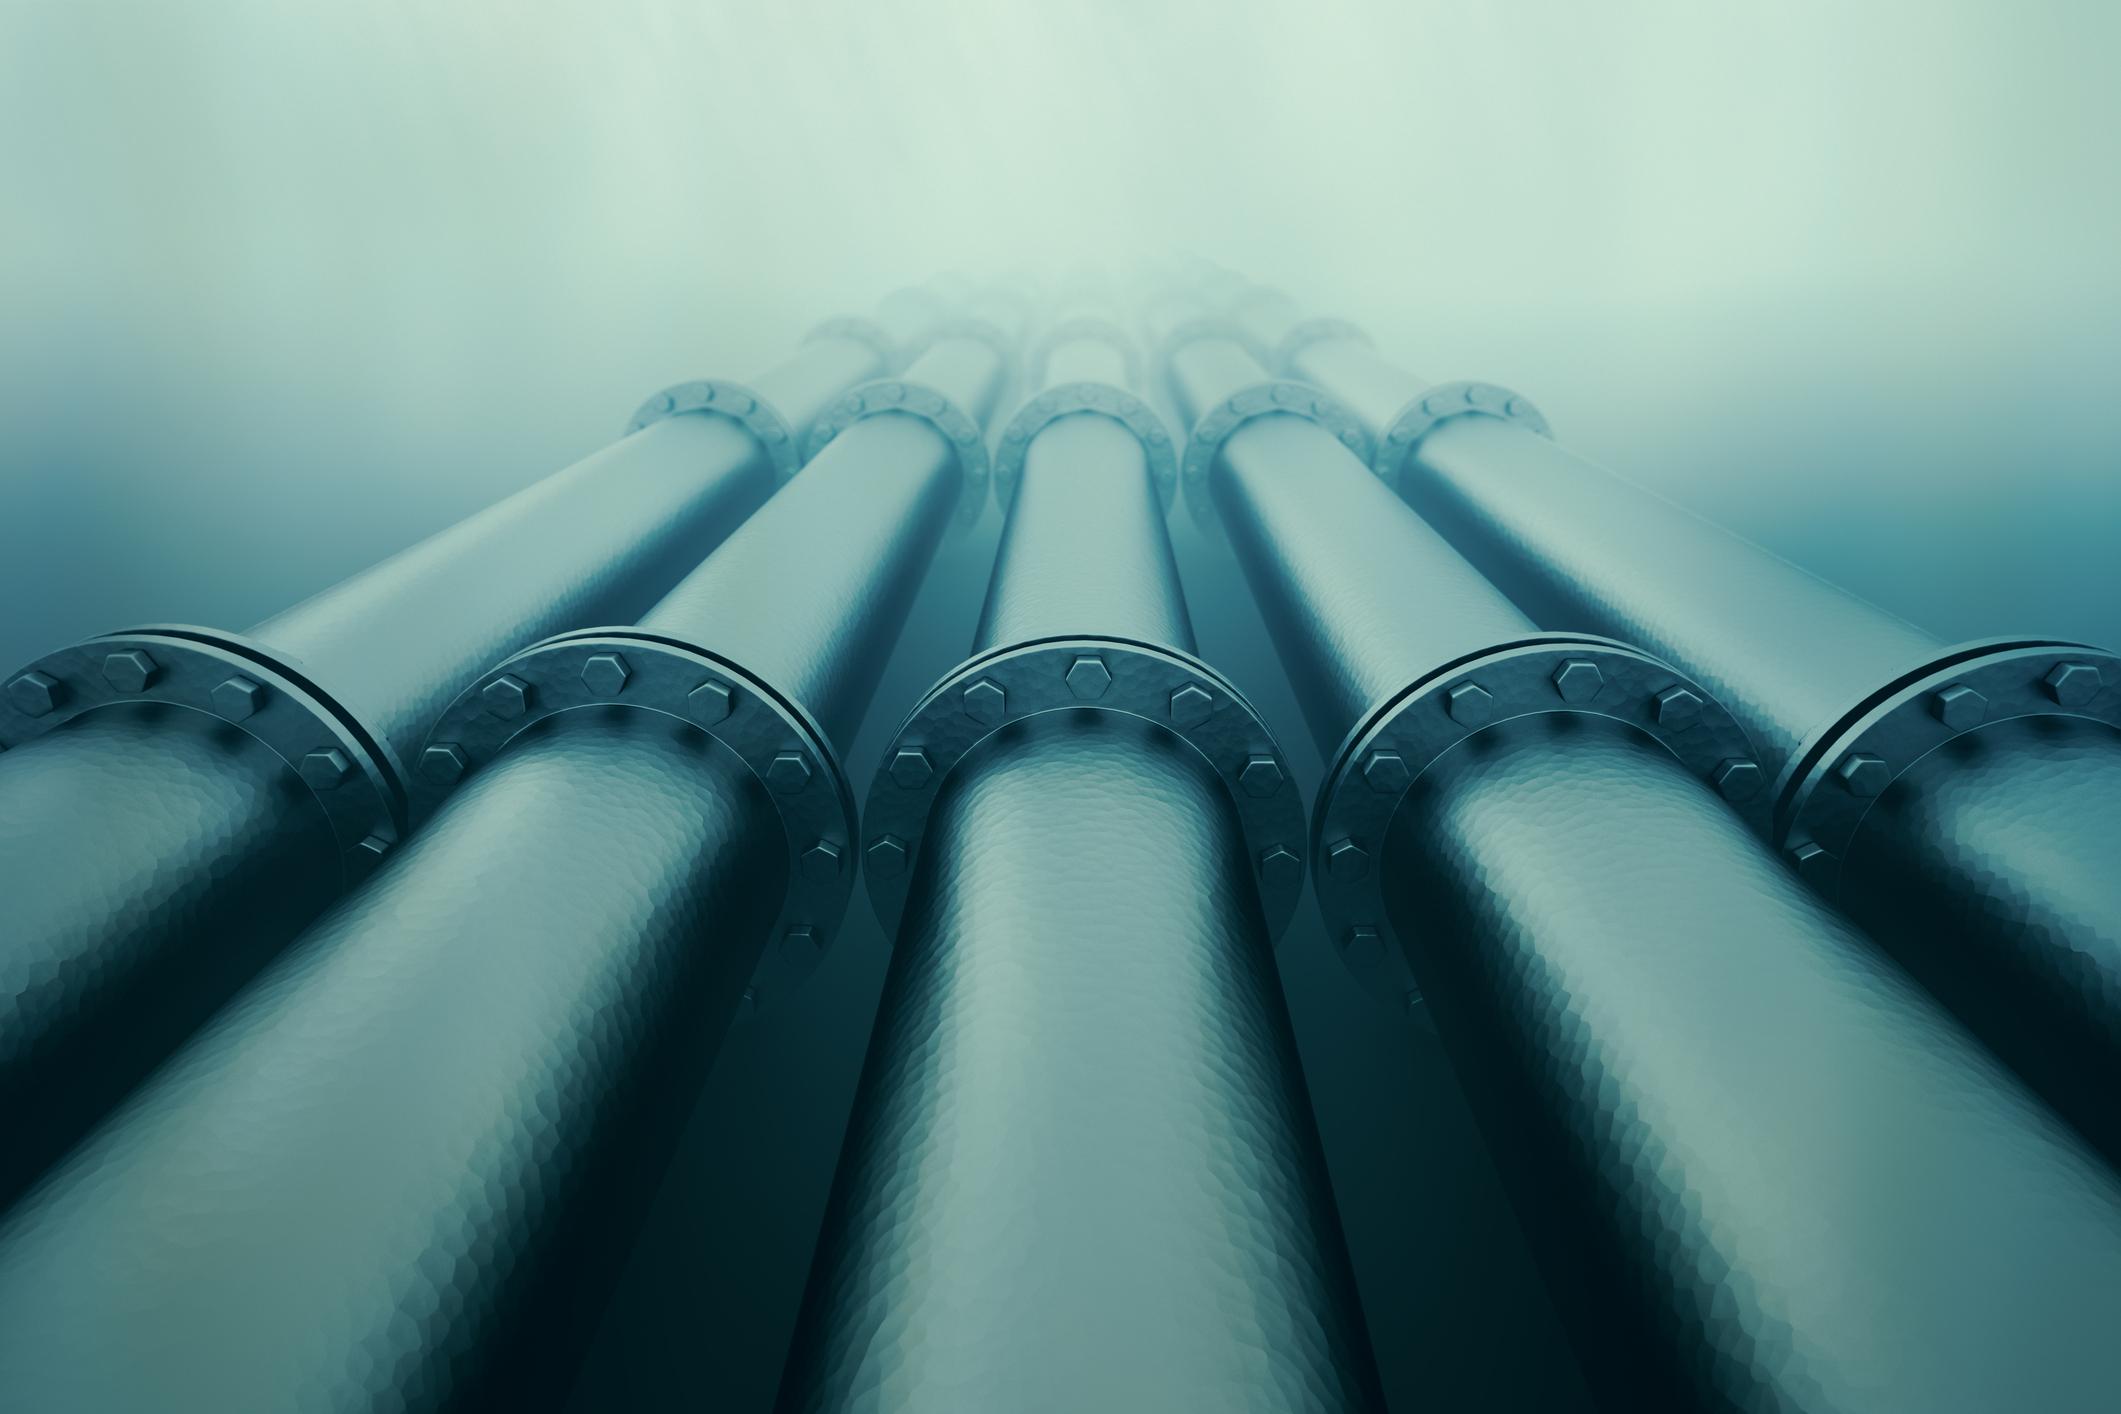 Underwater pipelines.